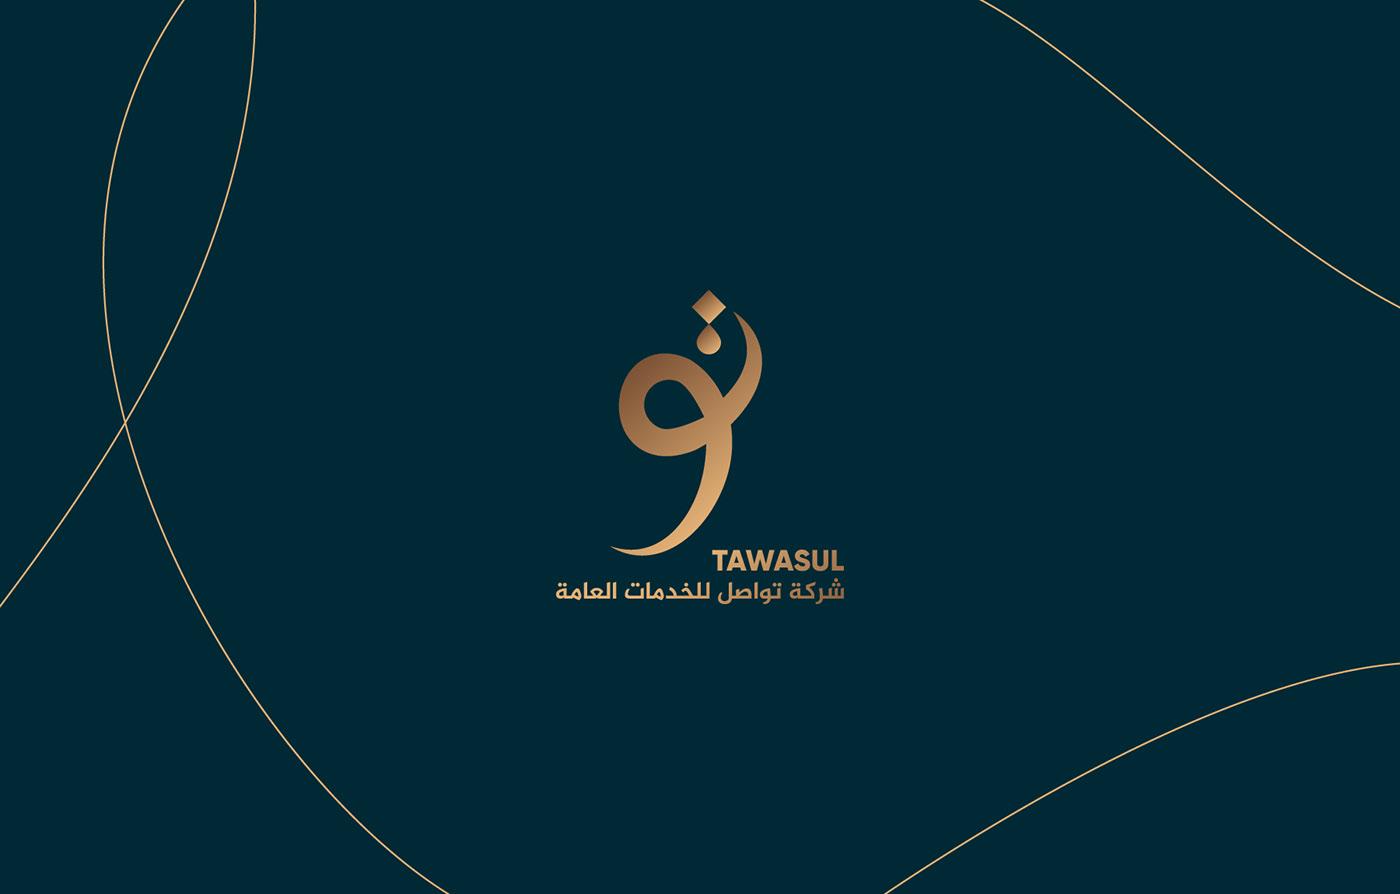 brand branding  elegant graphic dessign Identity Design istanbul logo Logo Design print Tawasul